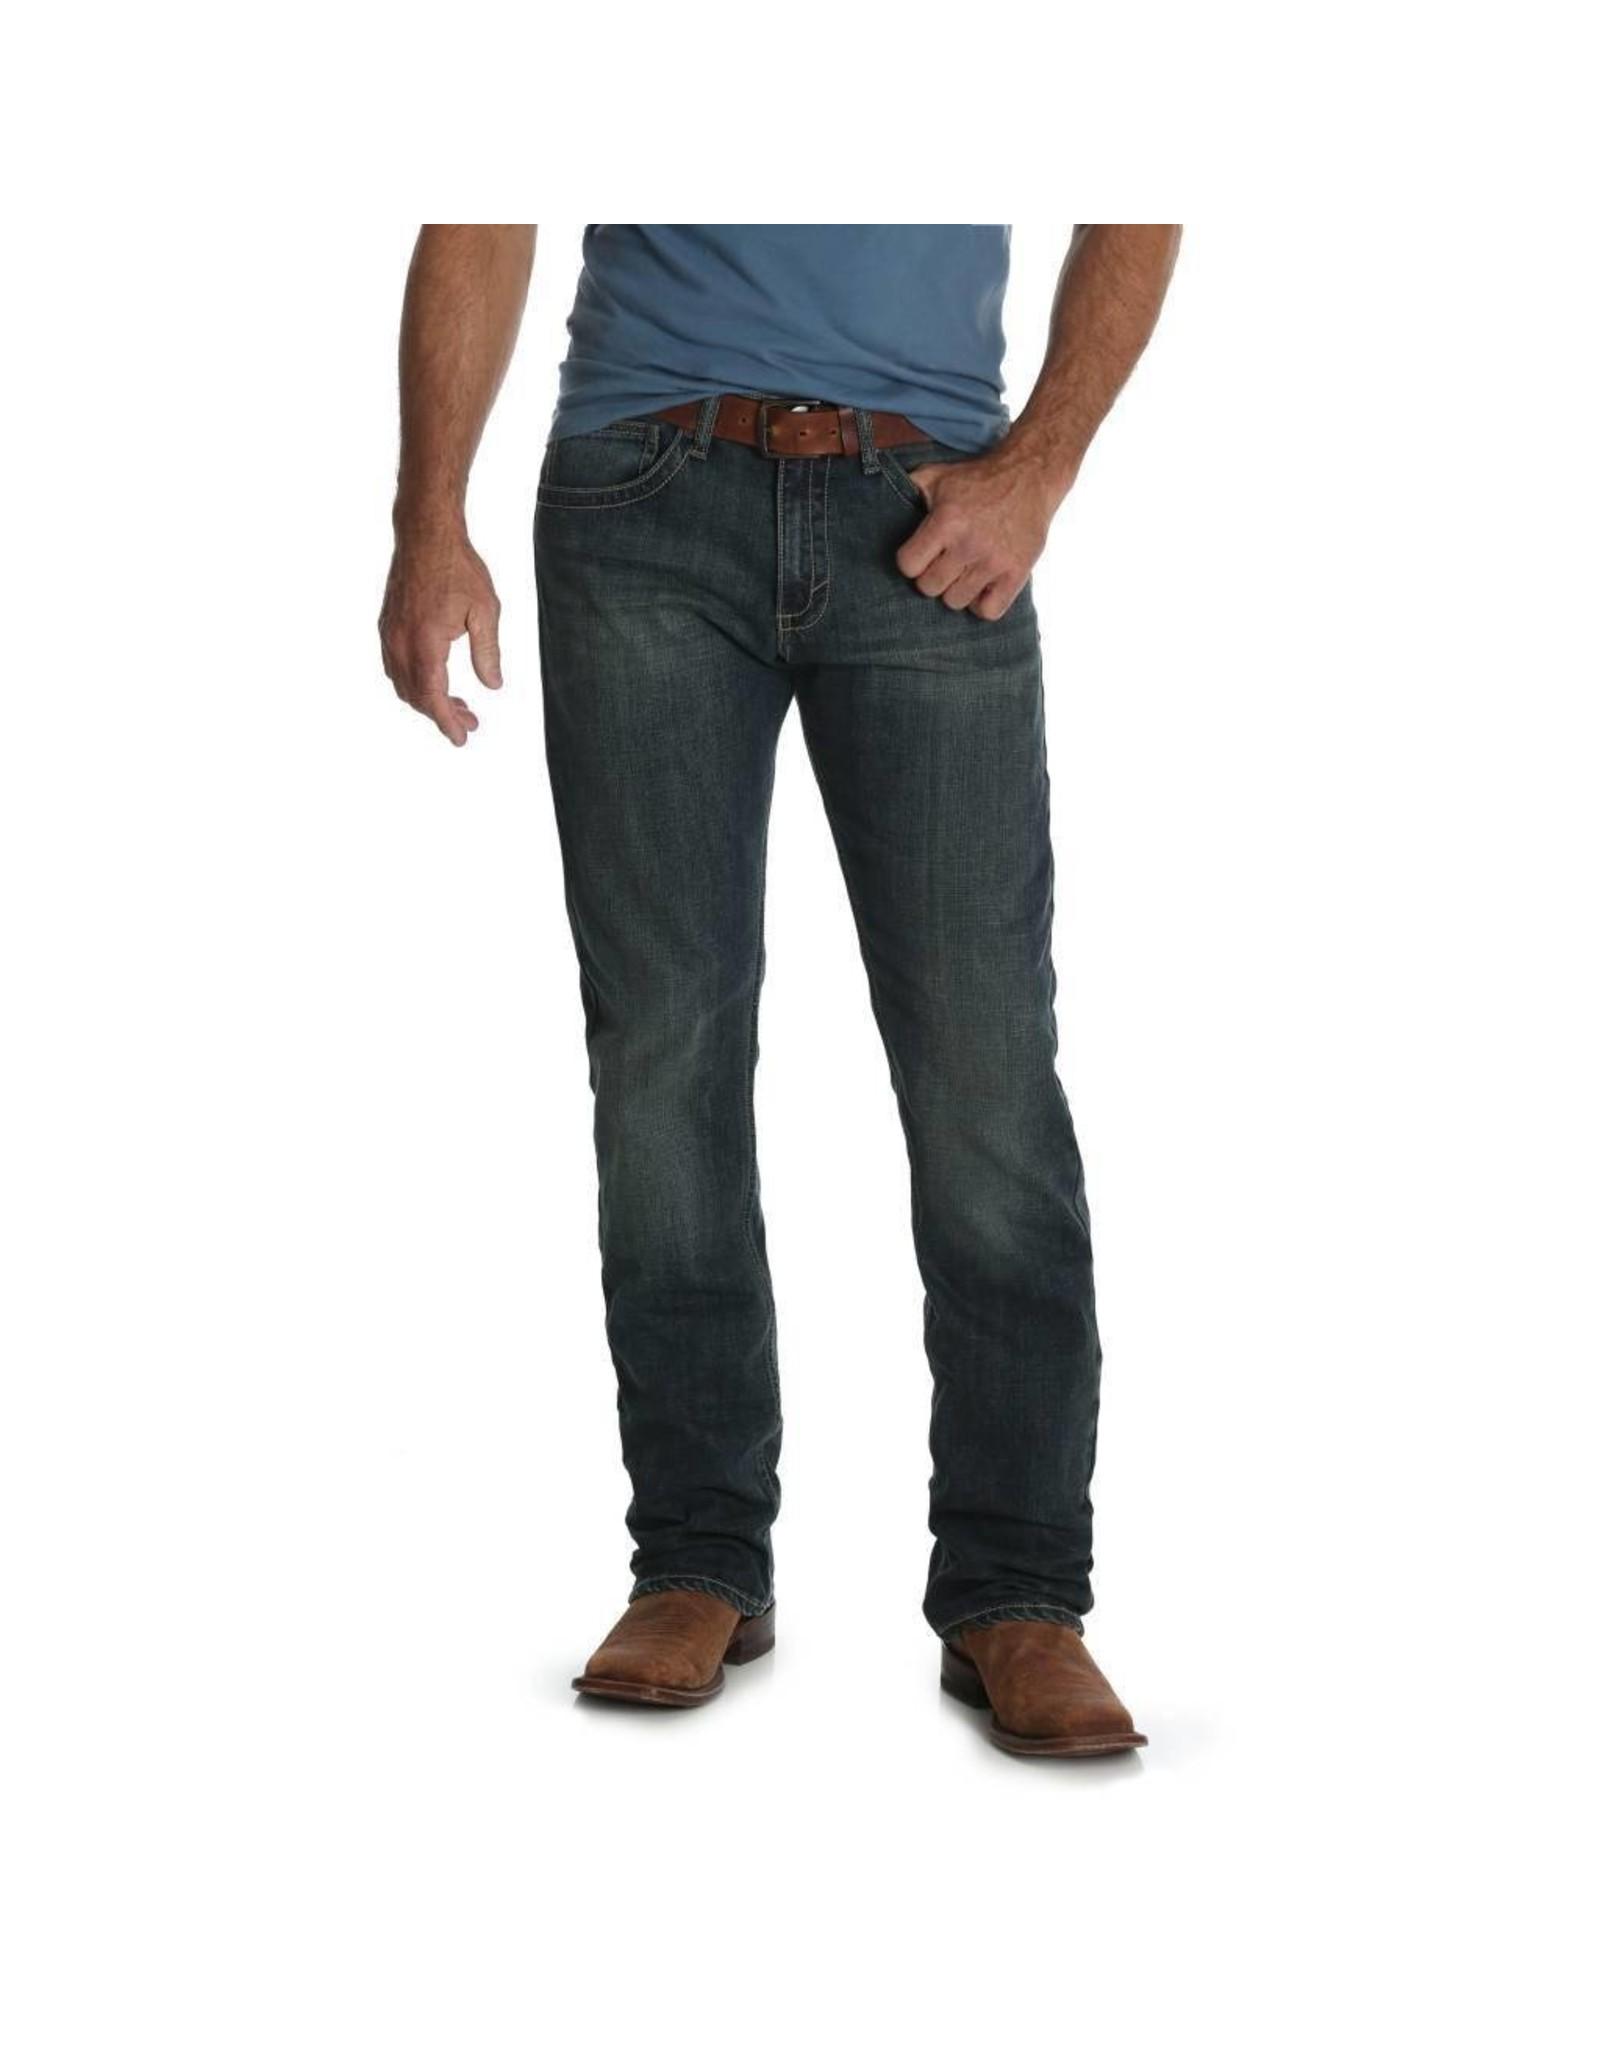 Jeans-Men Wrangler 44MWXMA Slim Straight 20X